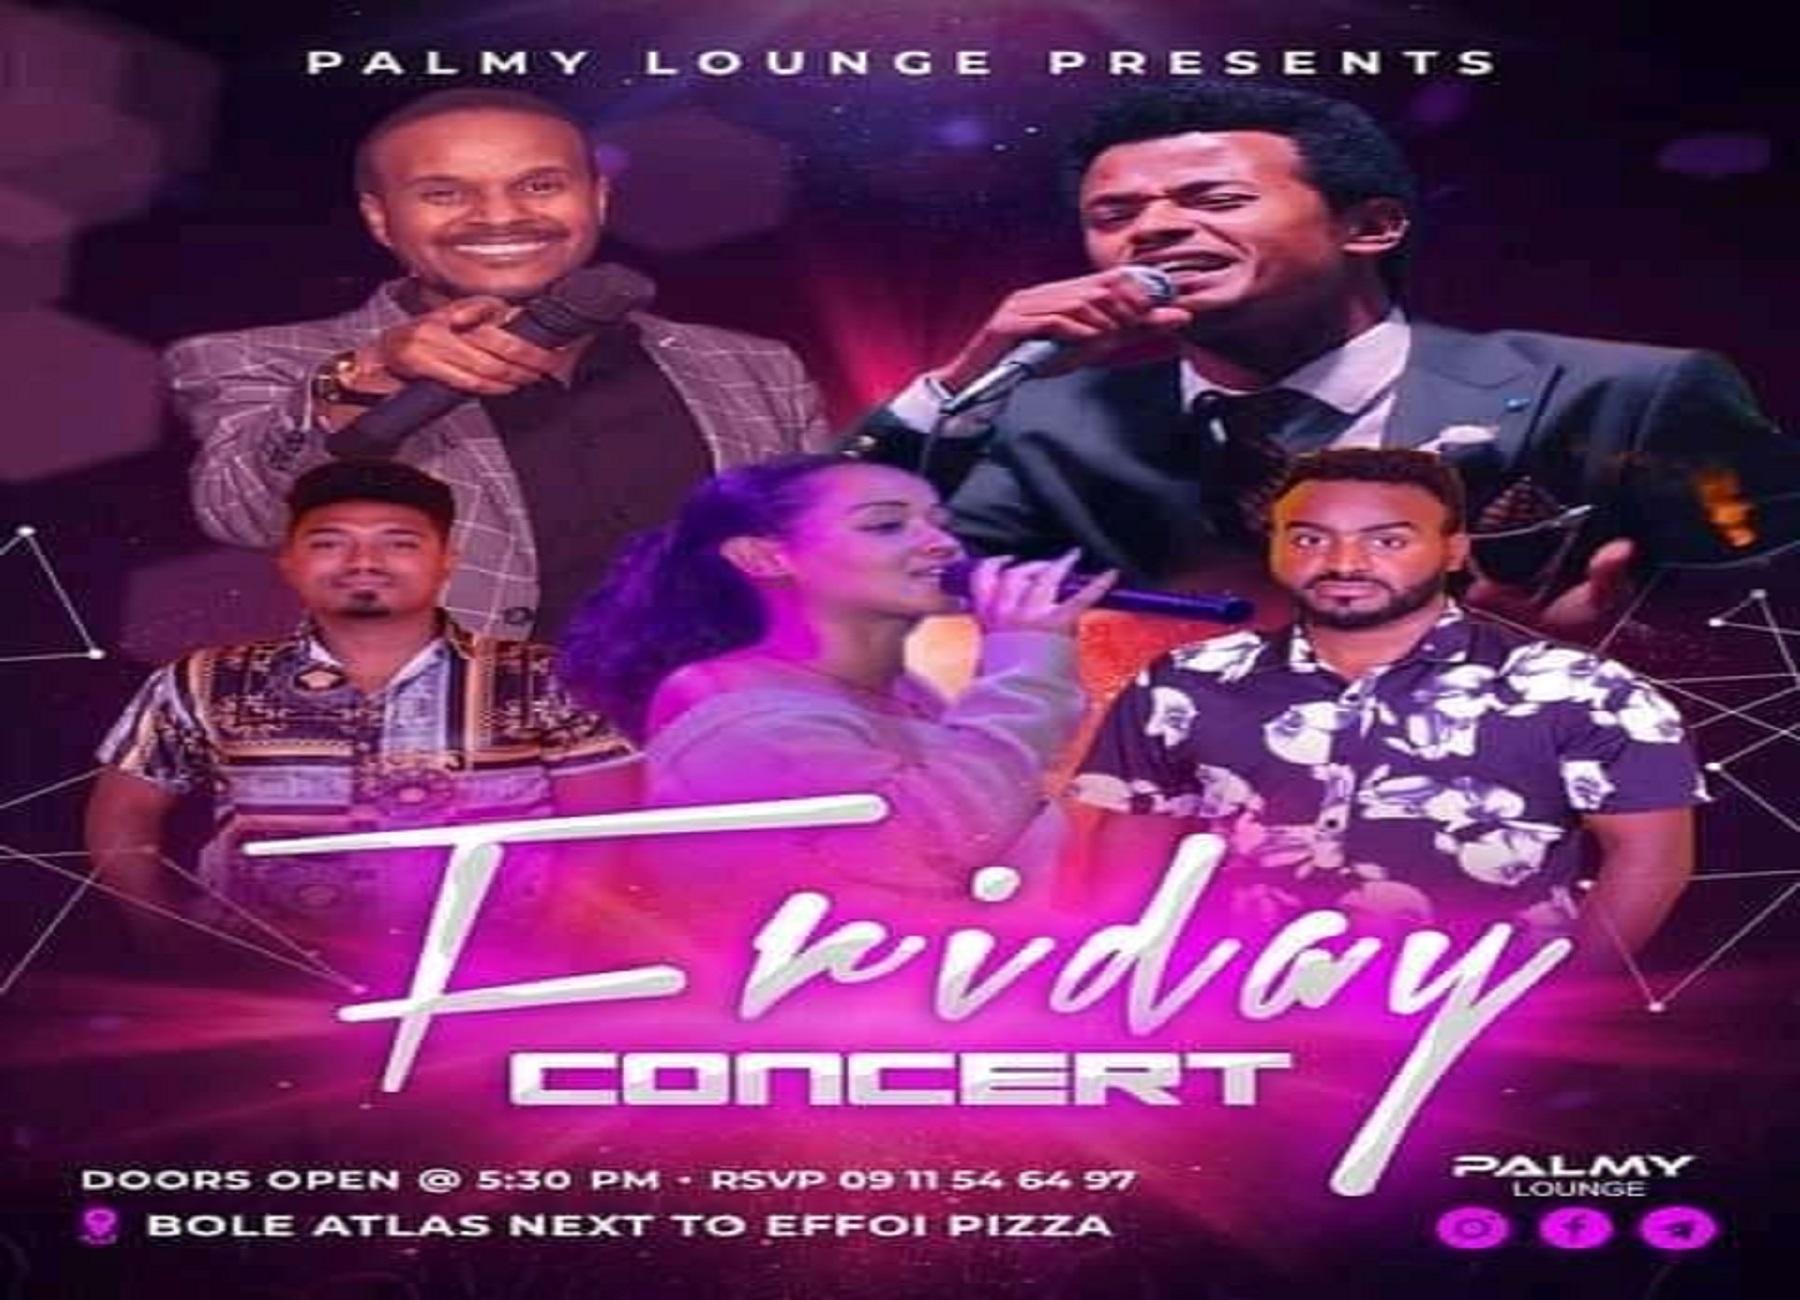 Friday Concert